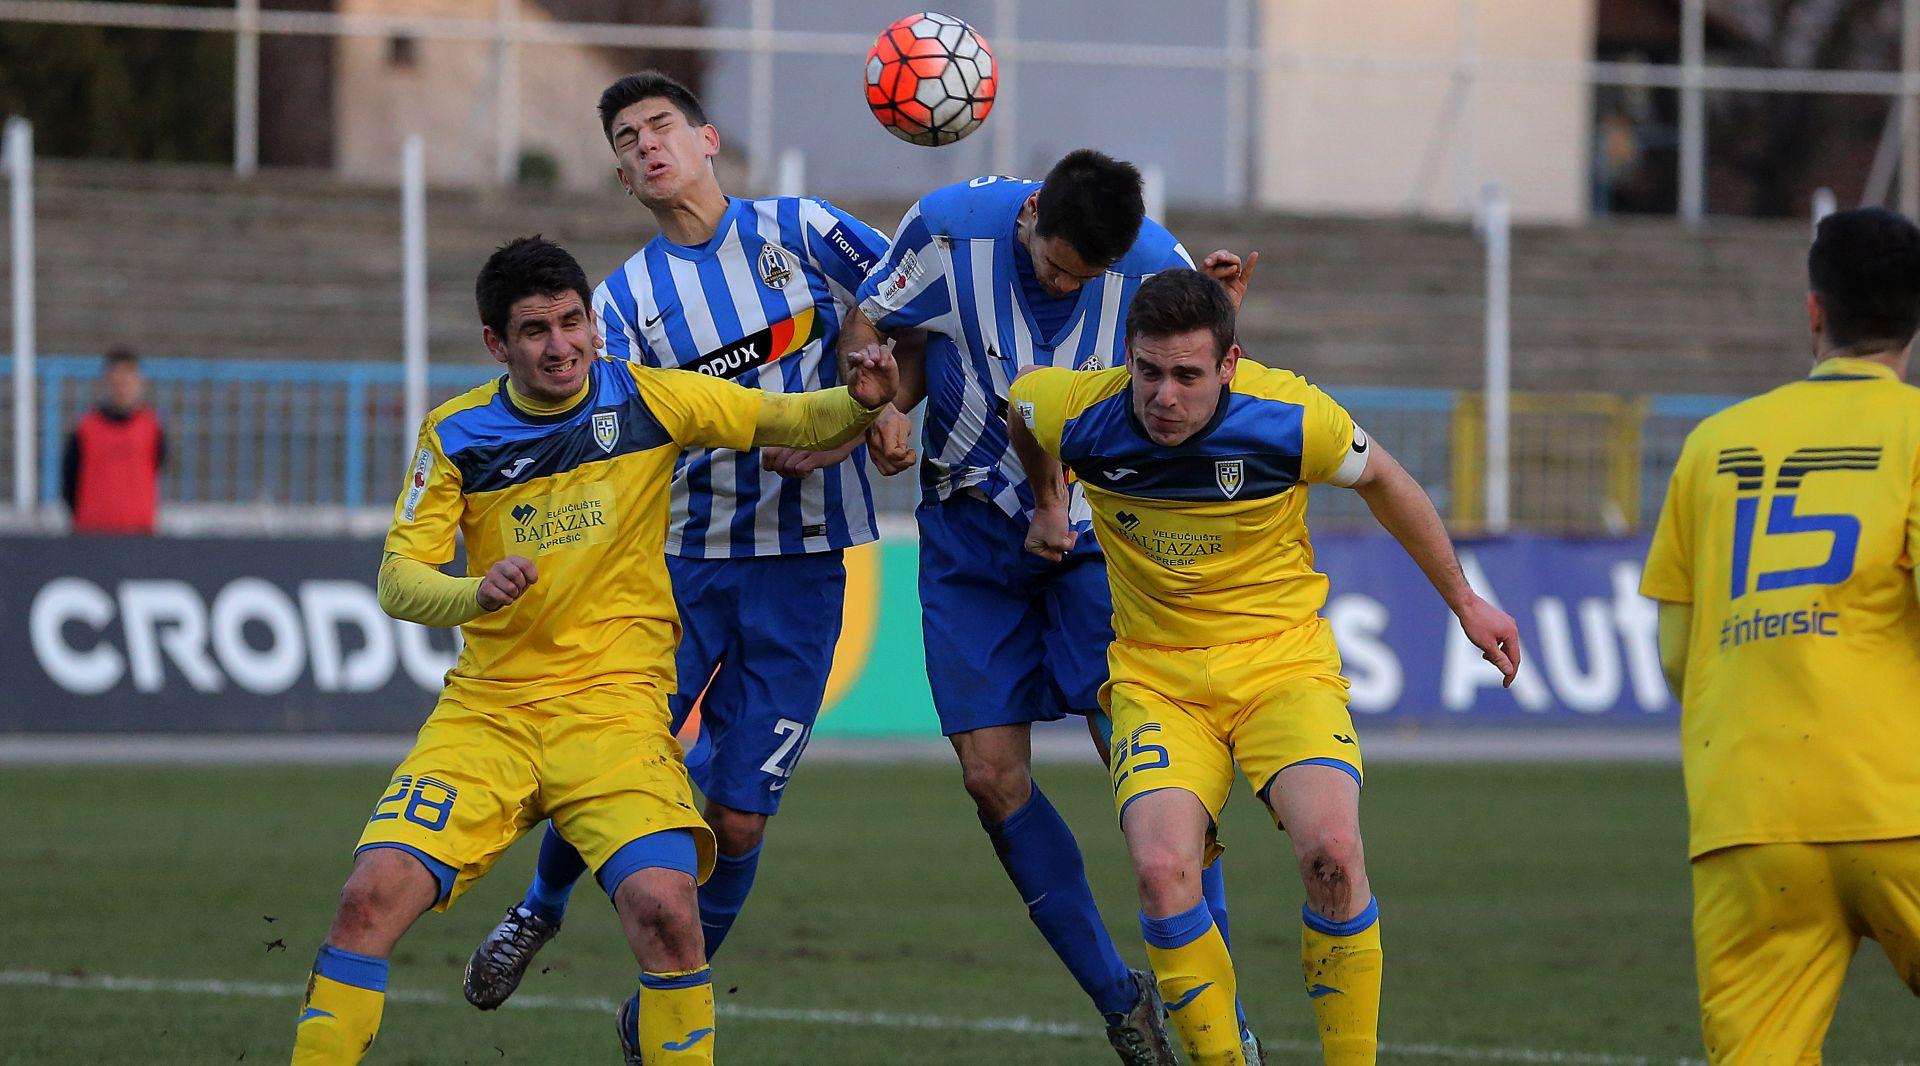 Prva HNL: Lokomotiva – Inter 1-2